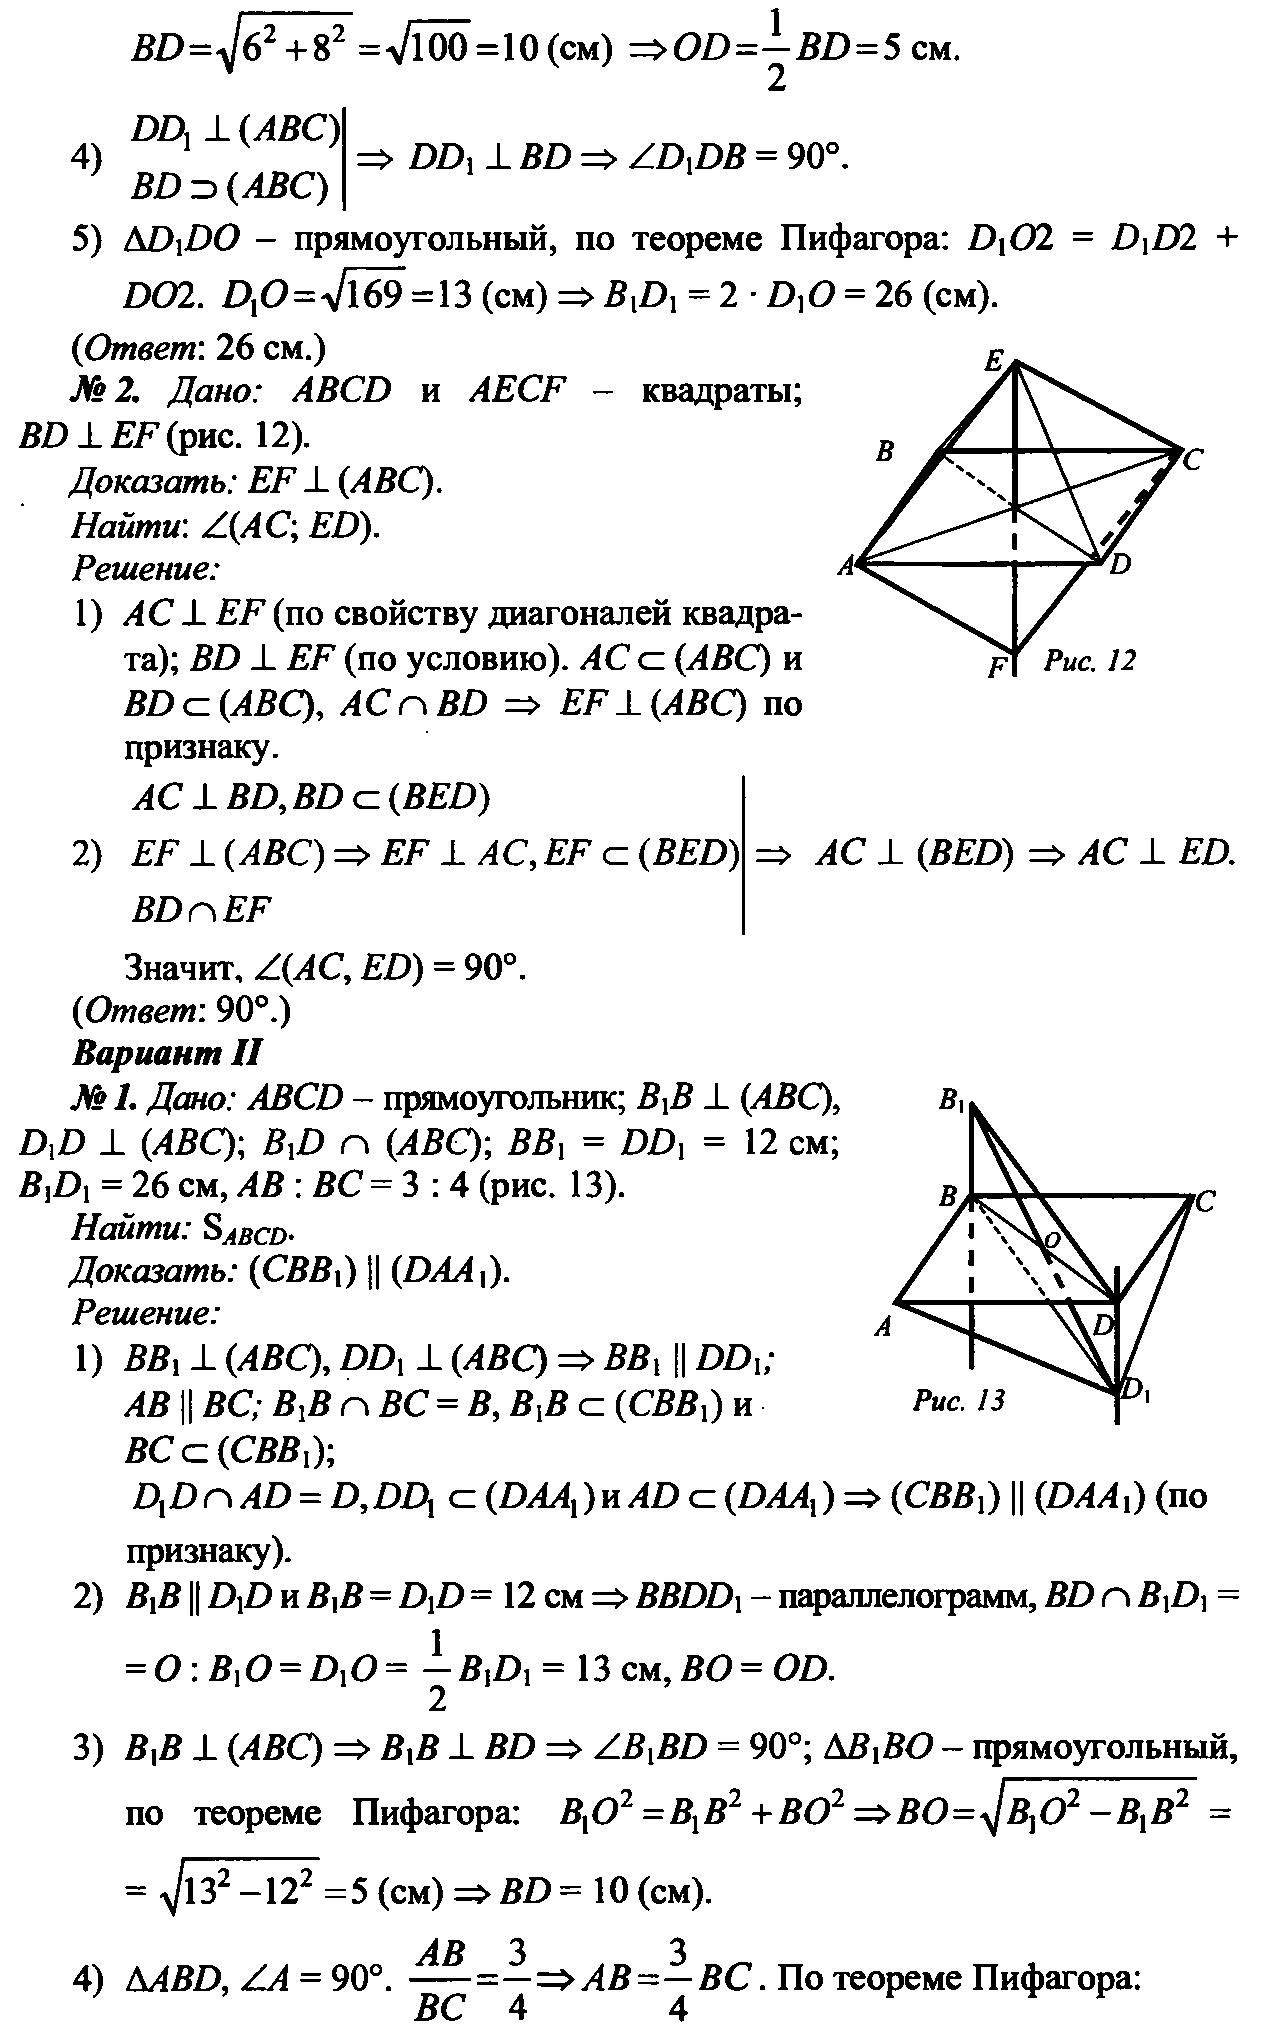 Рабочая программа по геометрии класс УМК Атанасян Л С  hello html m5ccf7ae4 png hello html 54396875 png 16 02 Контрольная работа